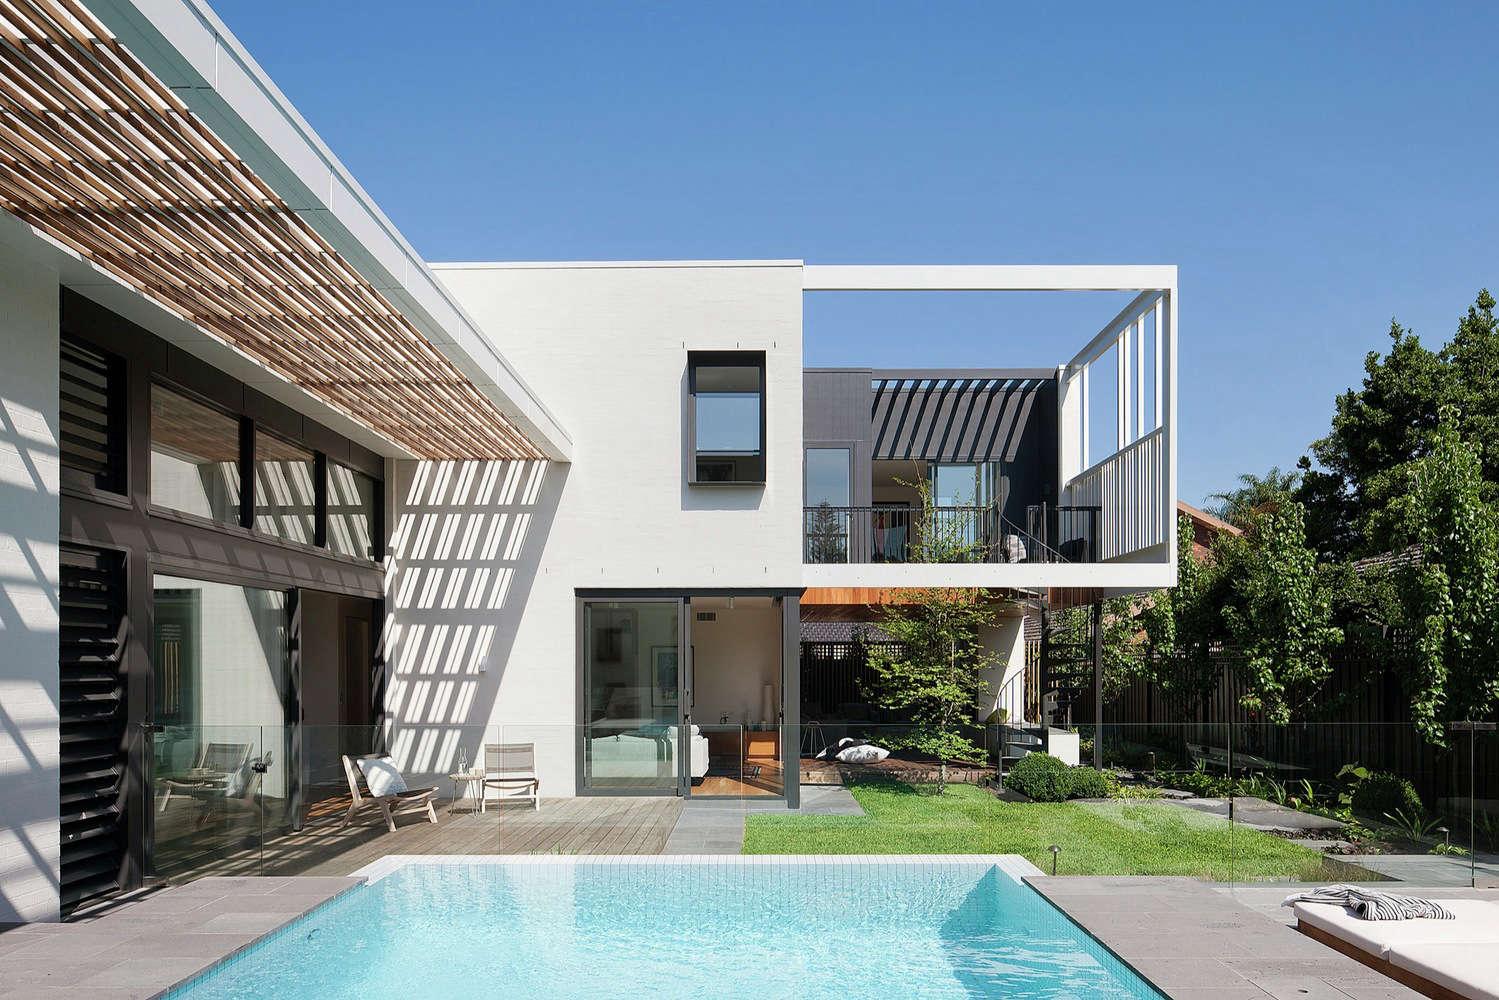 Architect Visit A Modern Landscape For A Midcentury